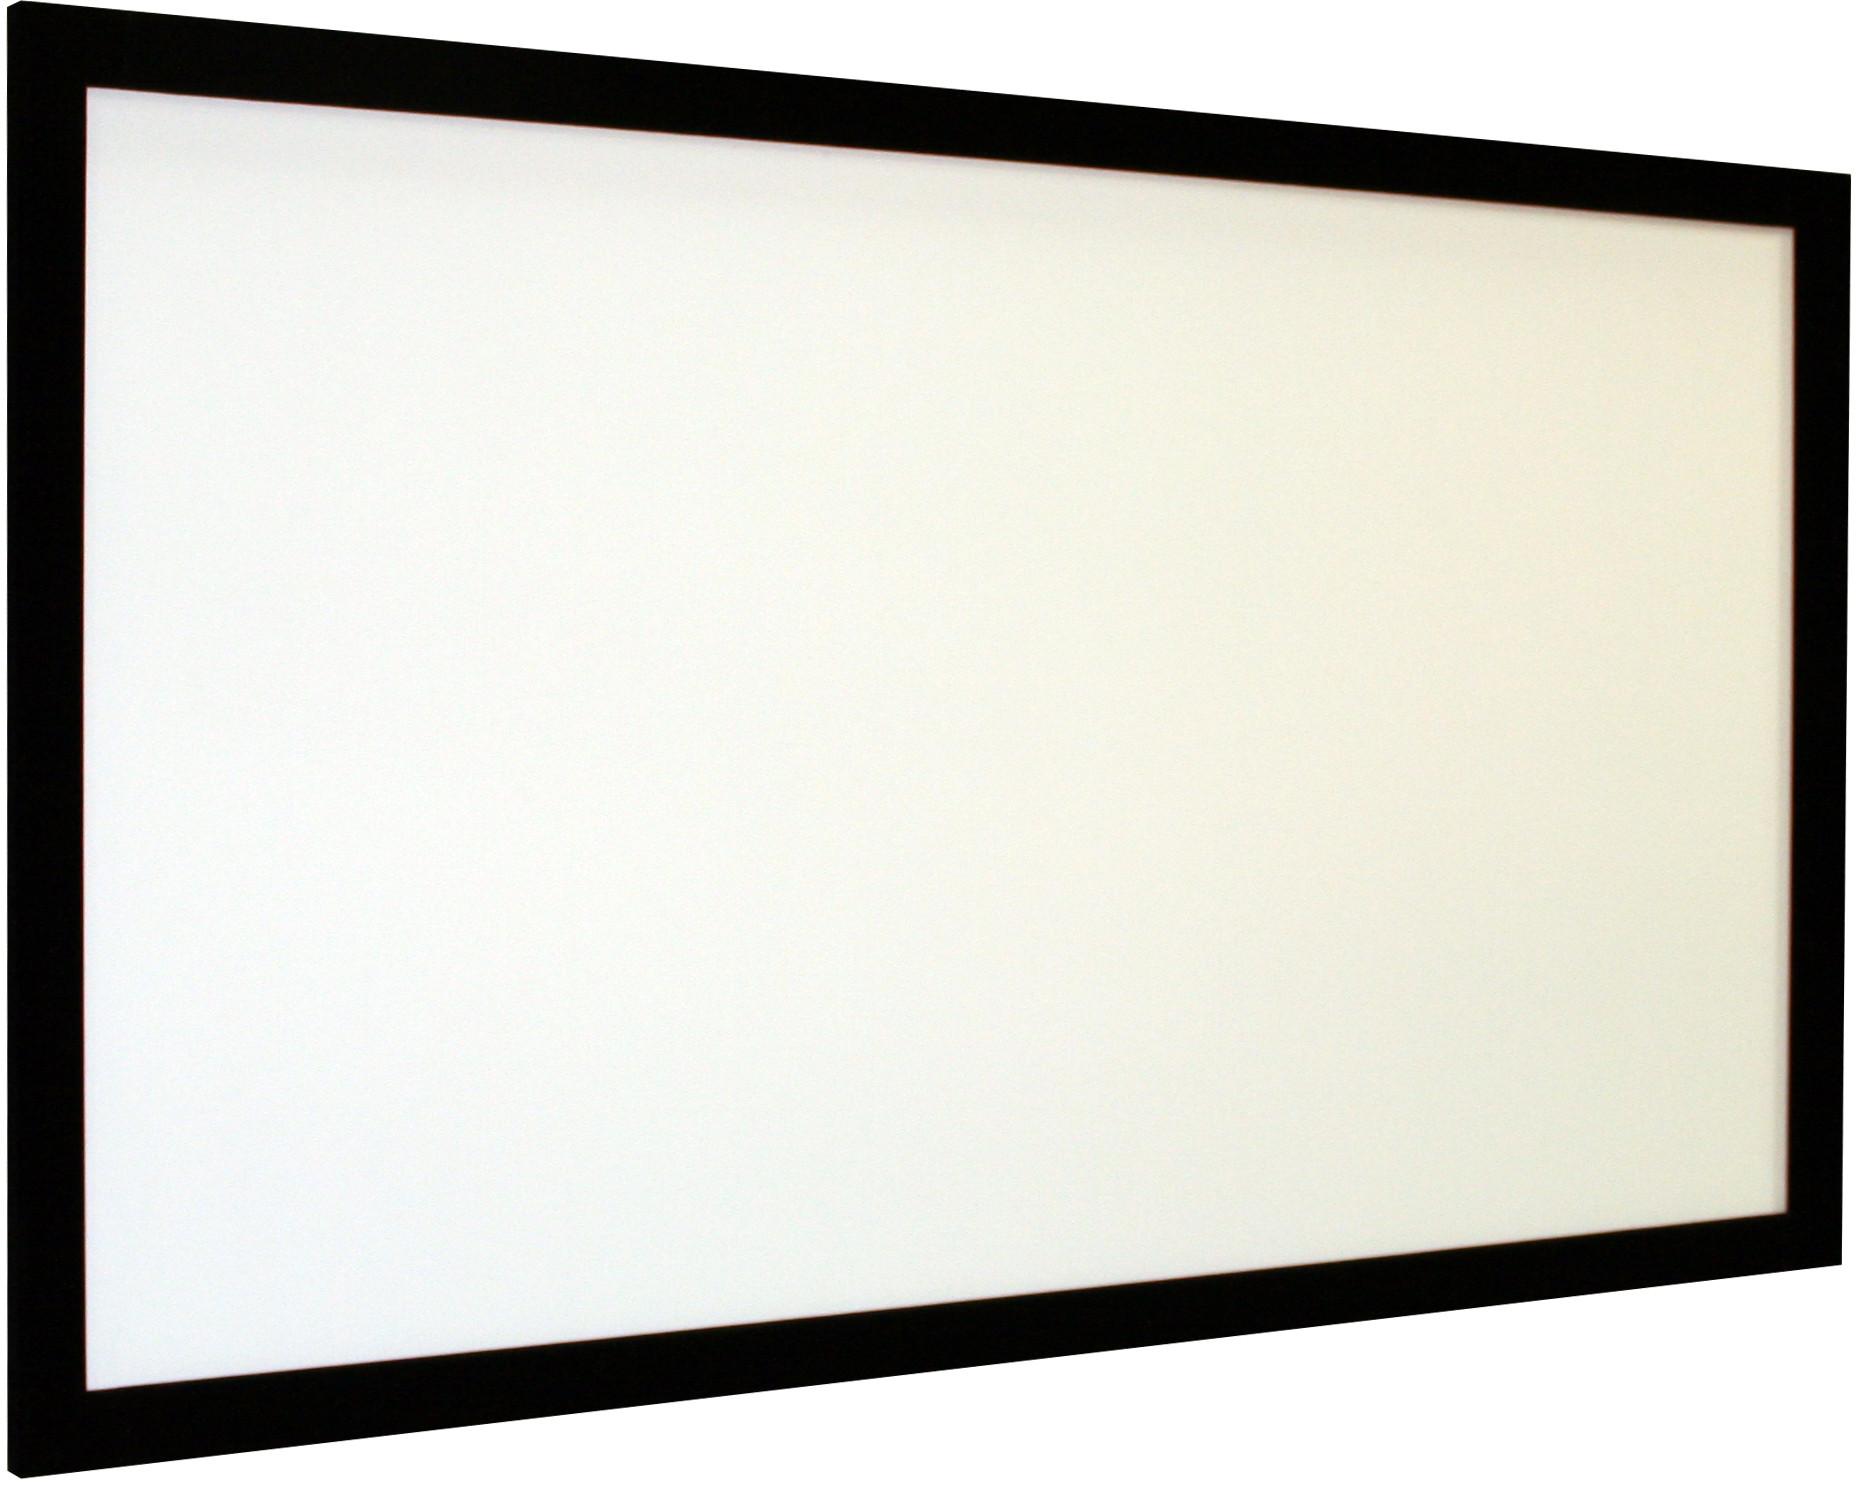 Vision Light 170 x 106 cm data format og Veltex ramme